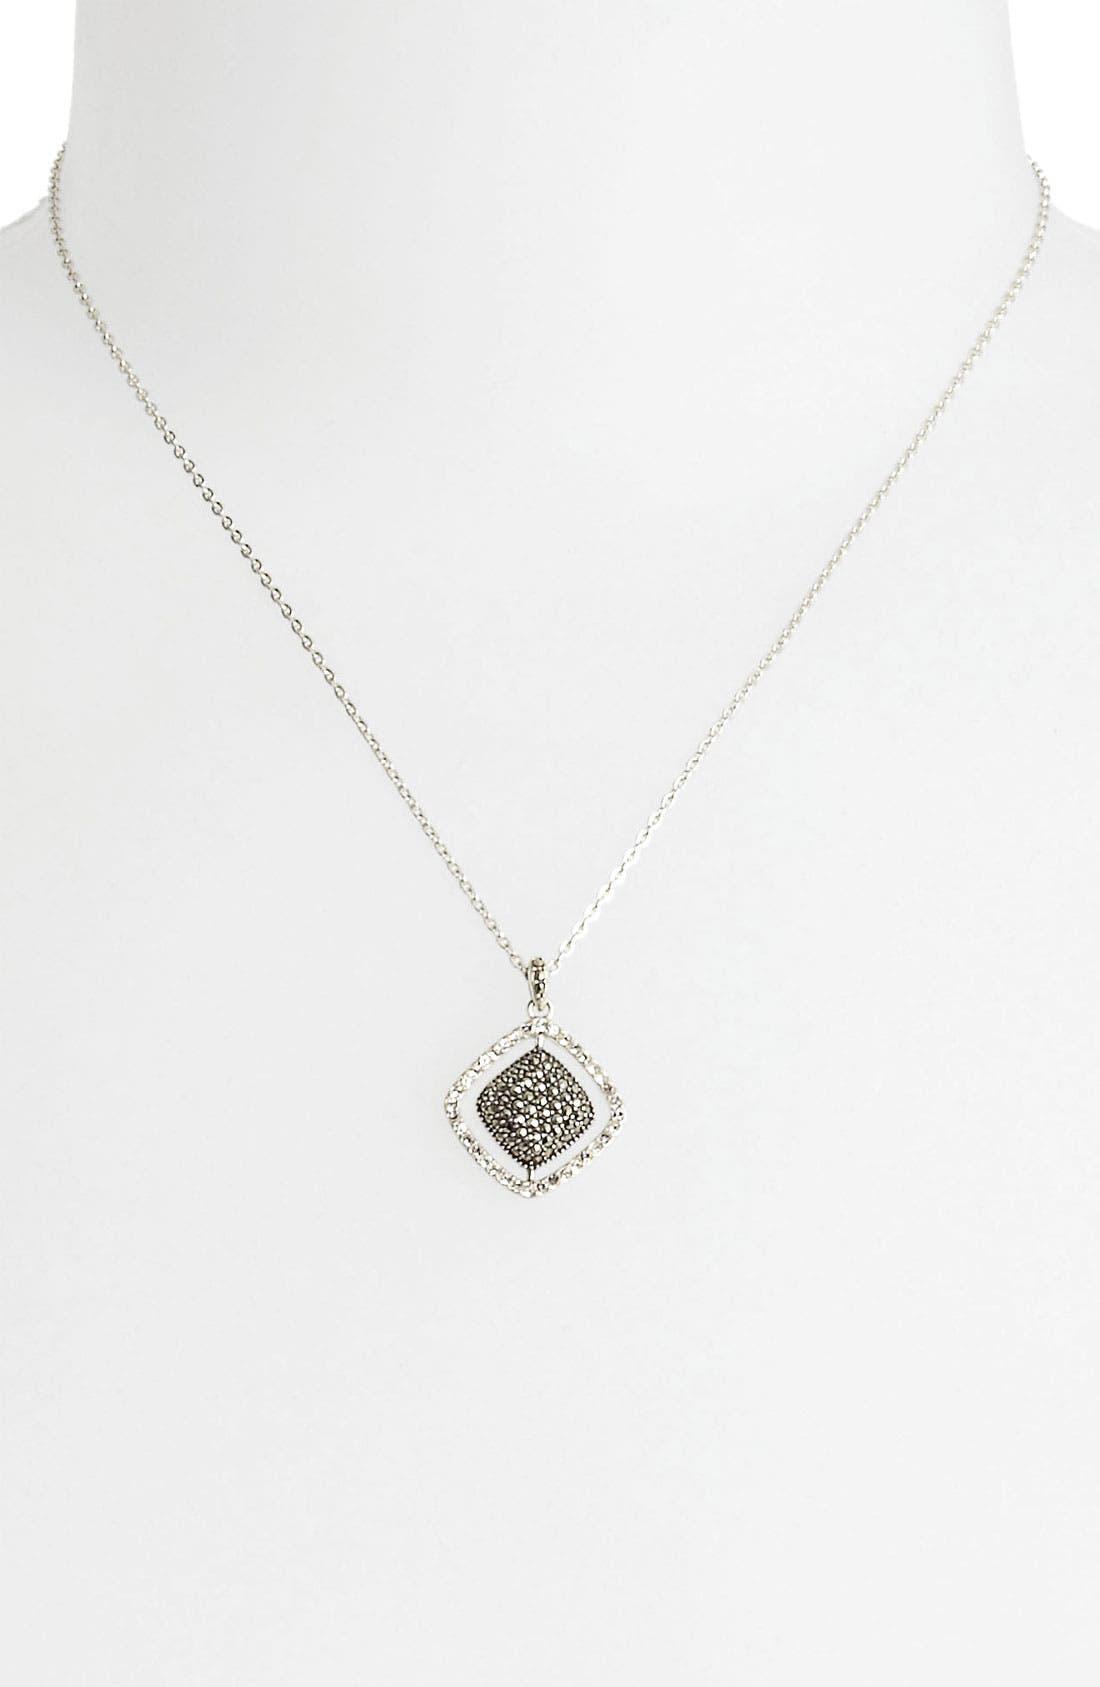 Alternate Image 1 Selected - Judith Jack Cushion Marcasite Pendant Necklace